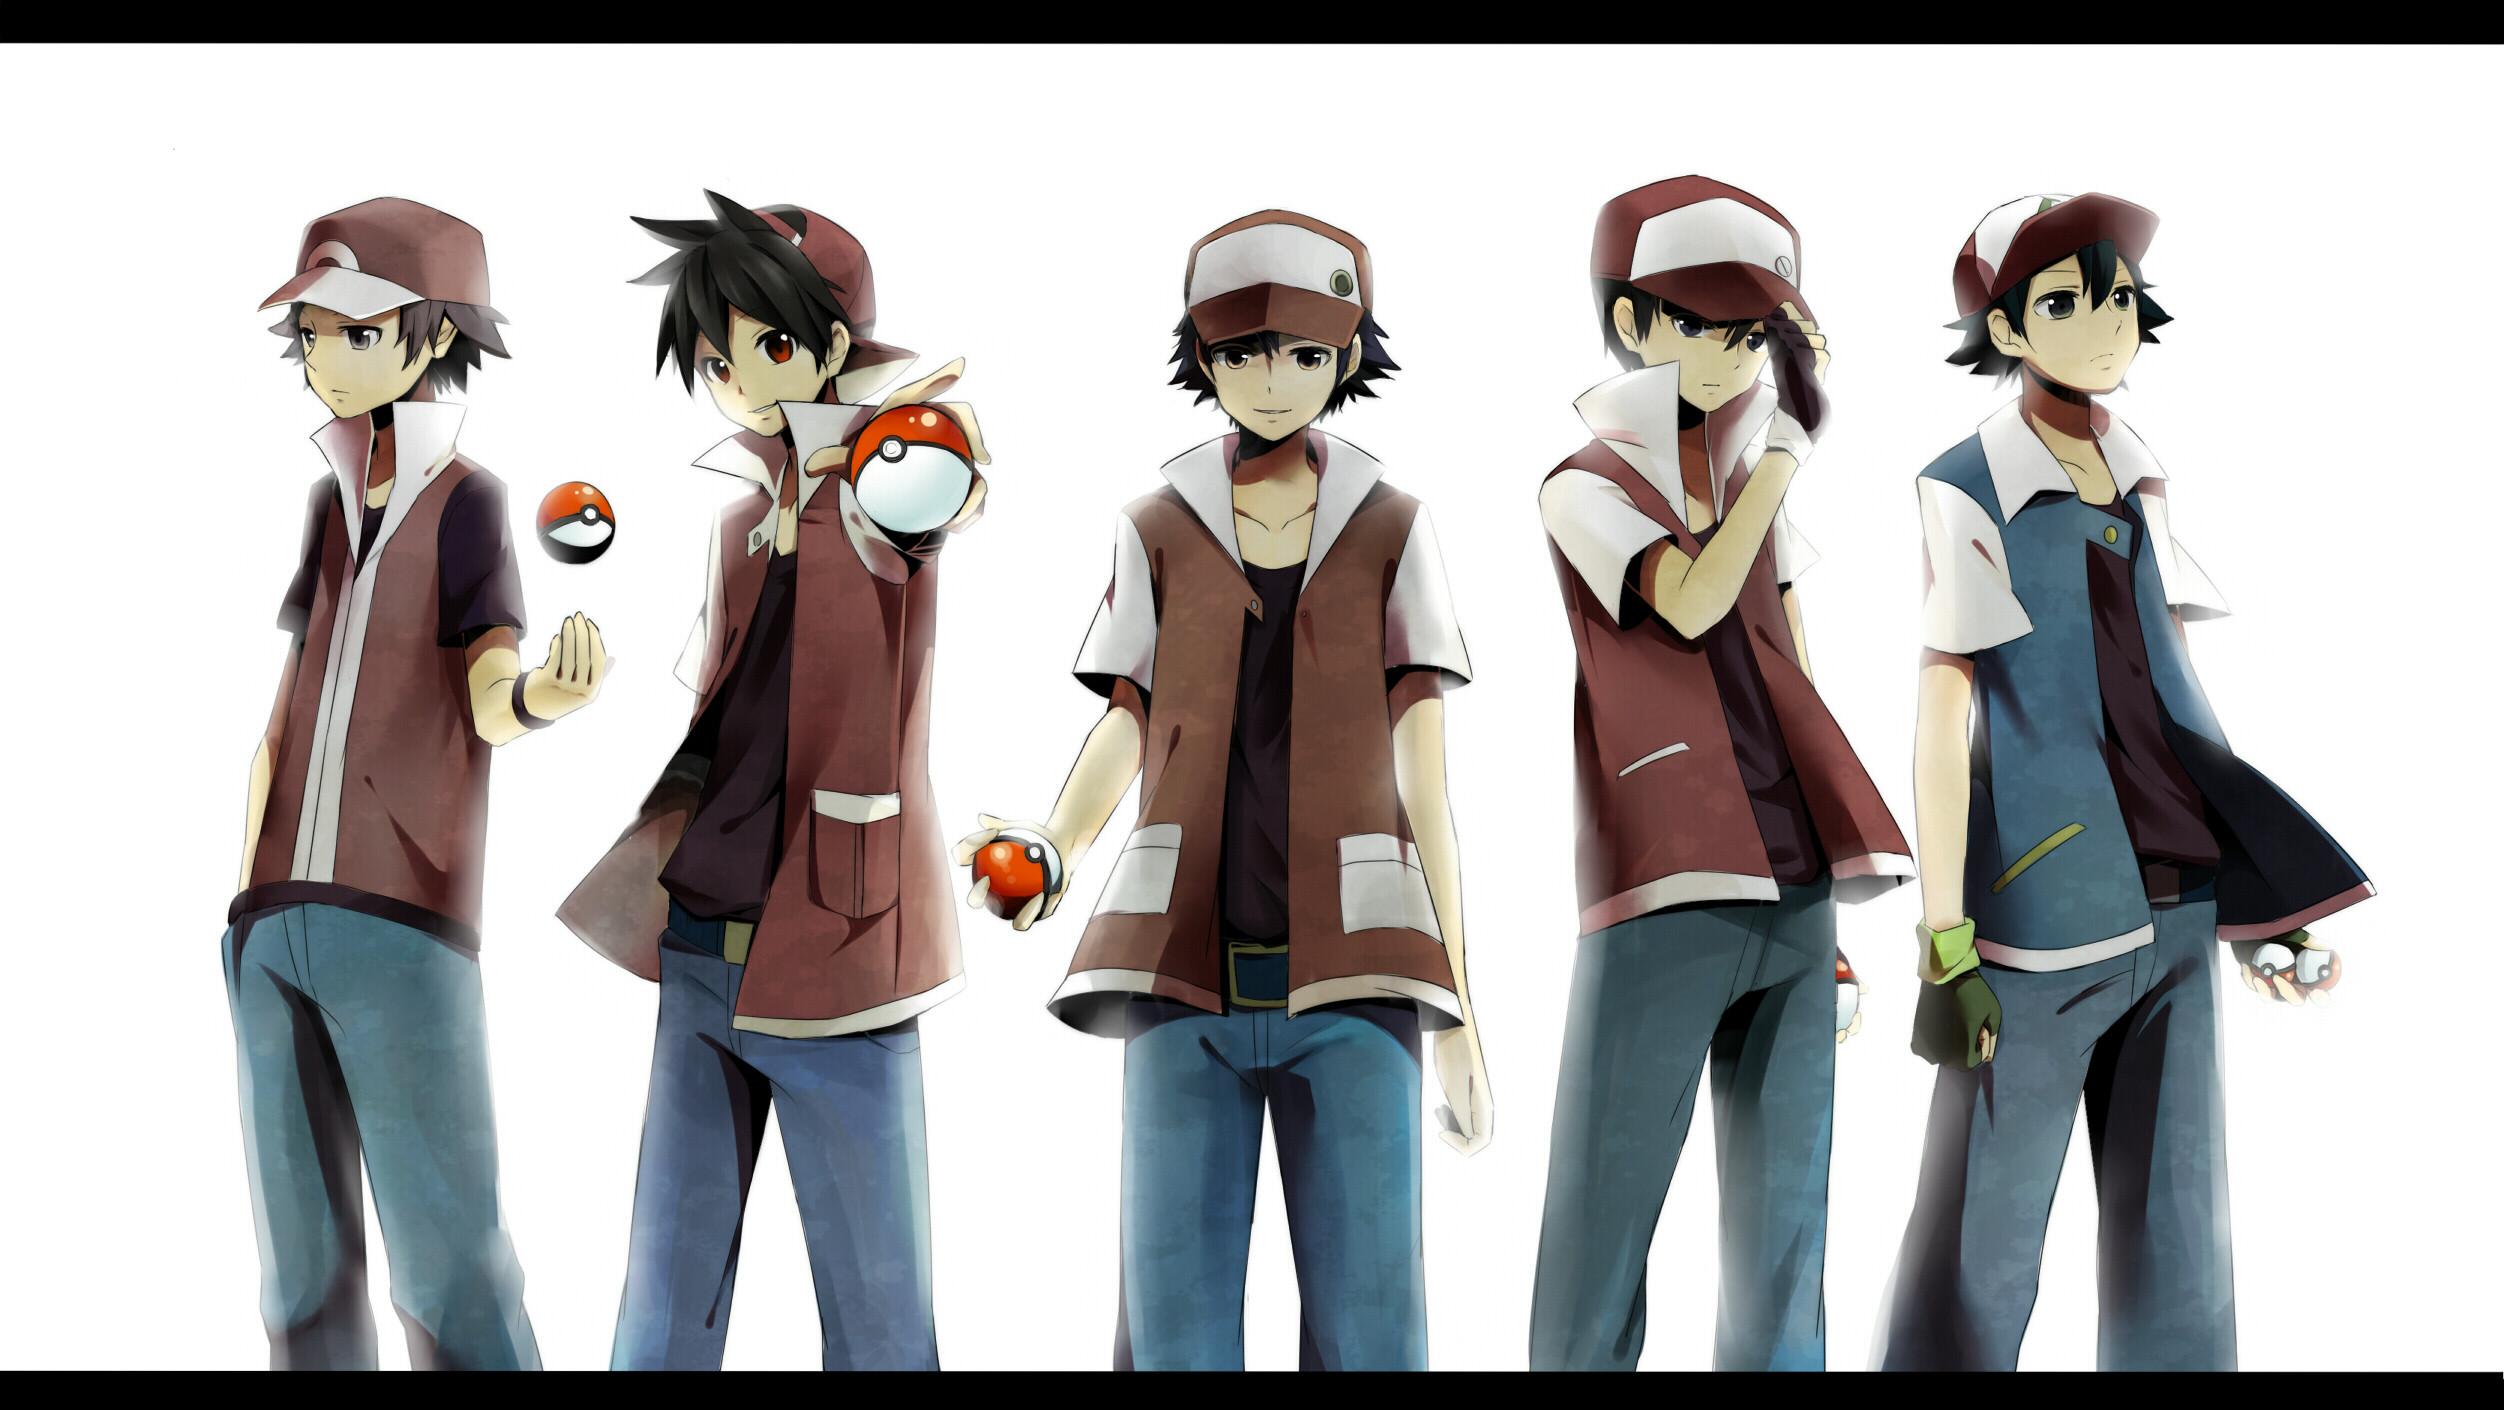 Pokémon SPECIAL · download Pokémon SPECIAL image